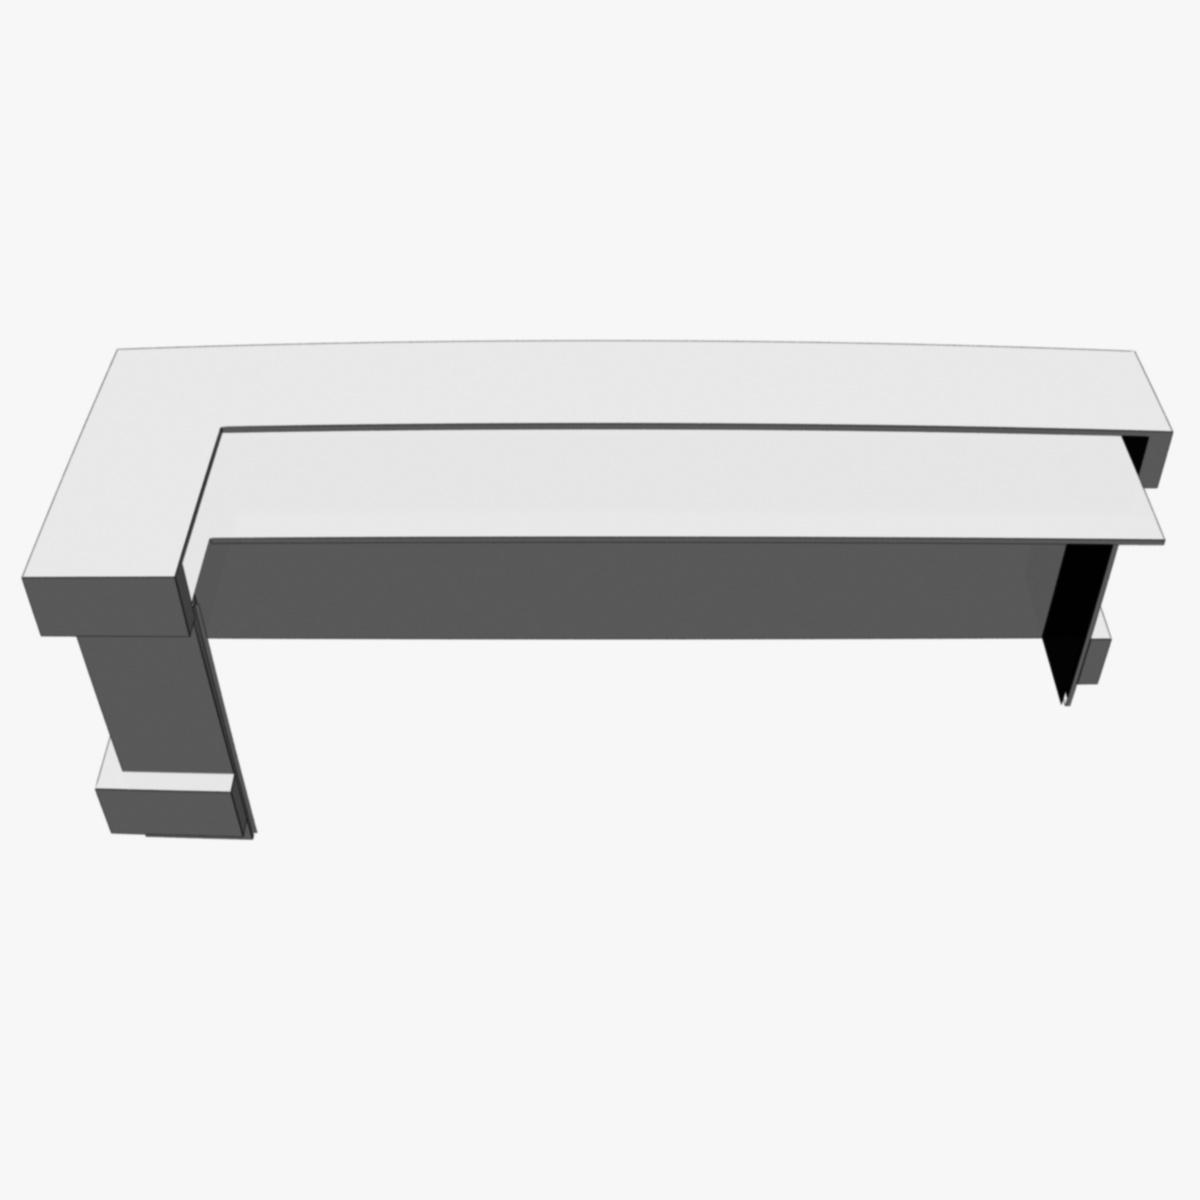 reception desk 1 3d model 3ds max dxf fbx  obj 219859